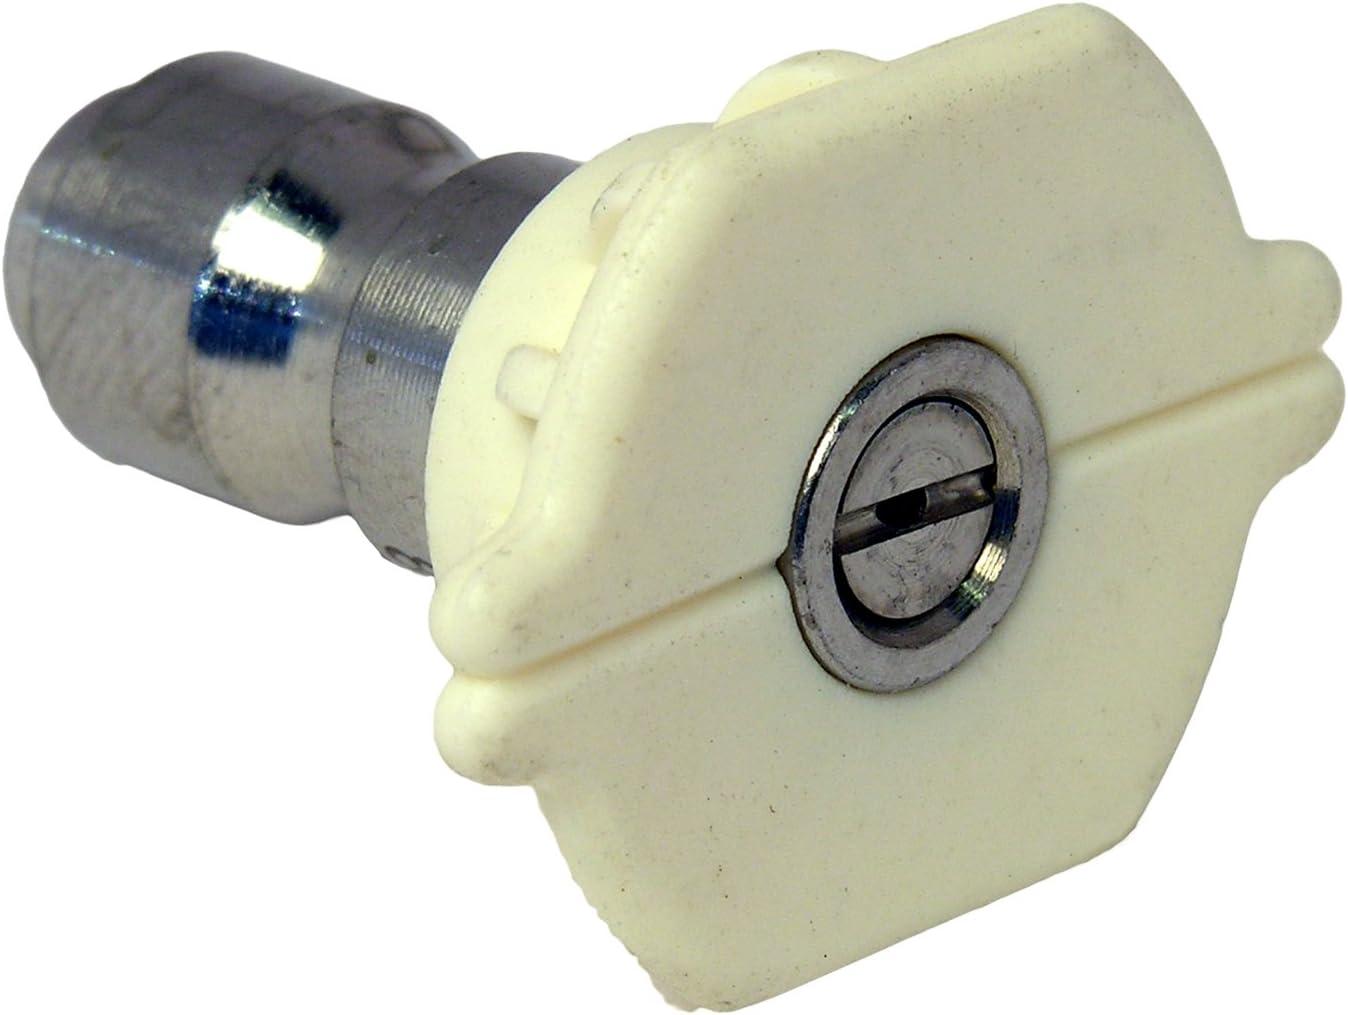 VAX VPW1 VPW2 VPW3 Pressure Washer Lance 020 Wash Nozzle Choose Length // Angle